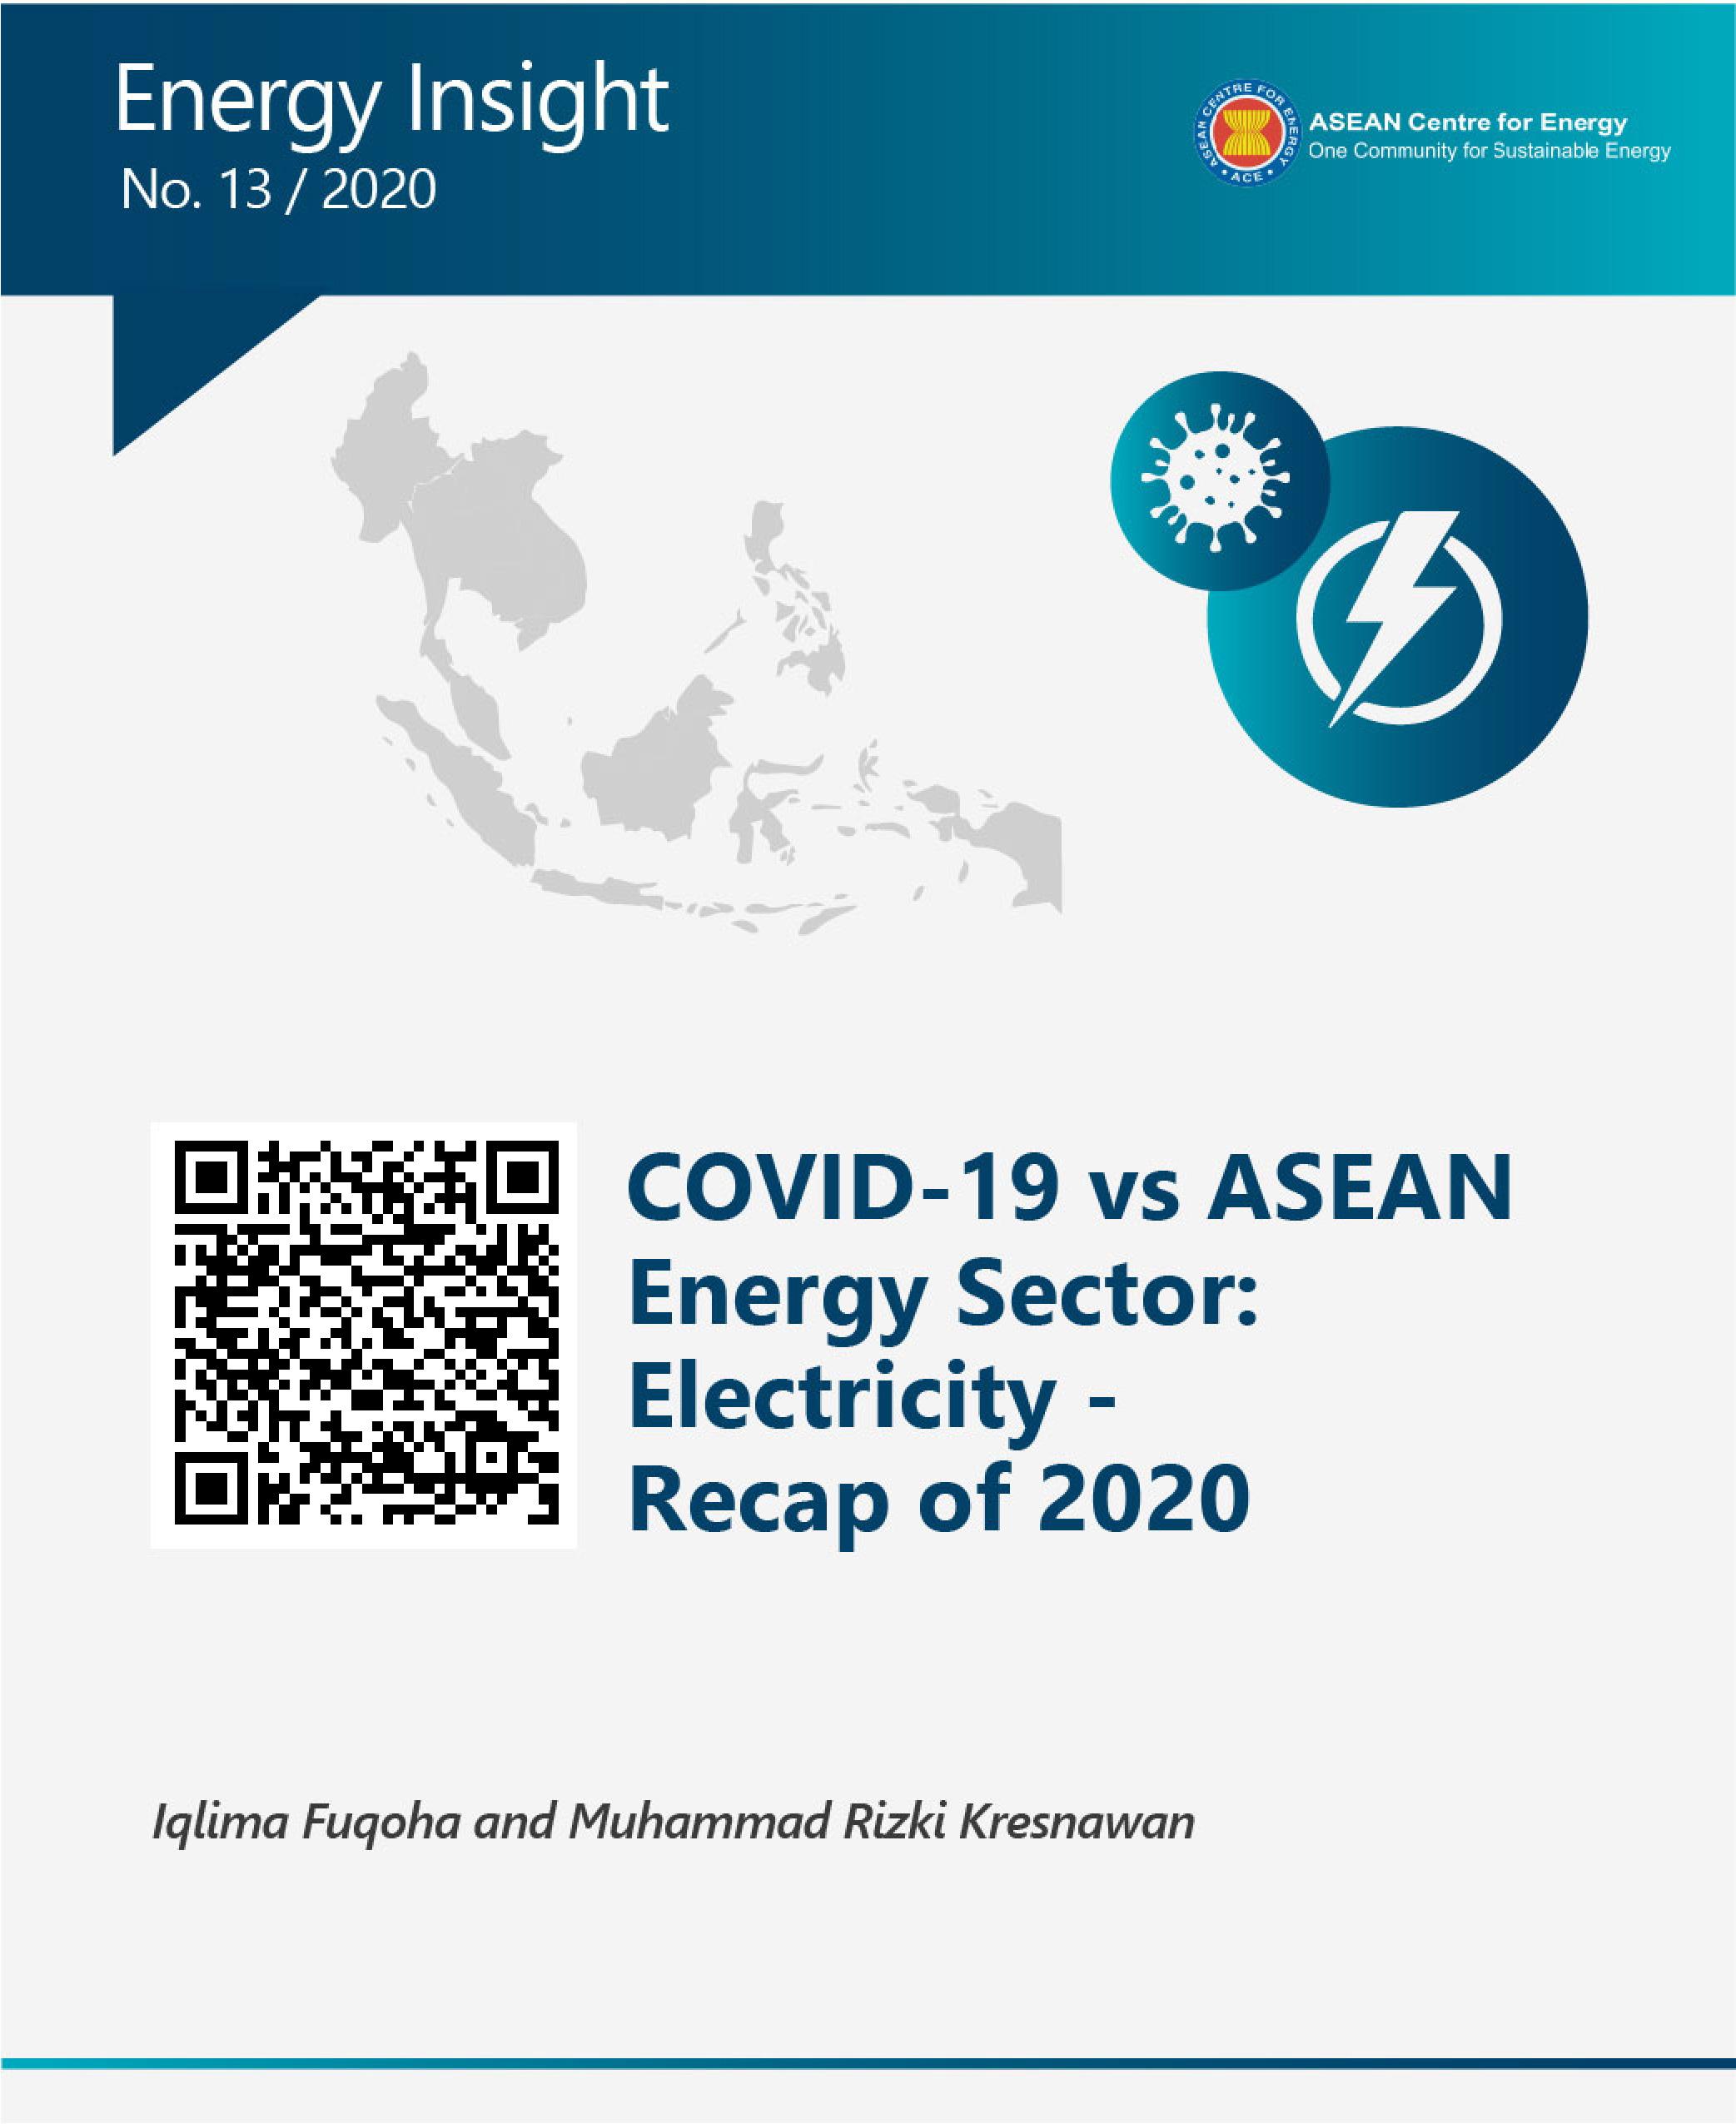 COVID-19 vs ASEAN Energy Sector: Electricity - Recap of 2020